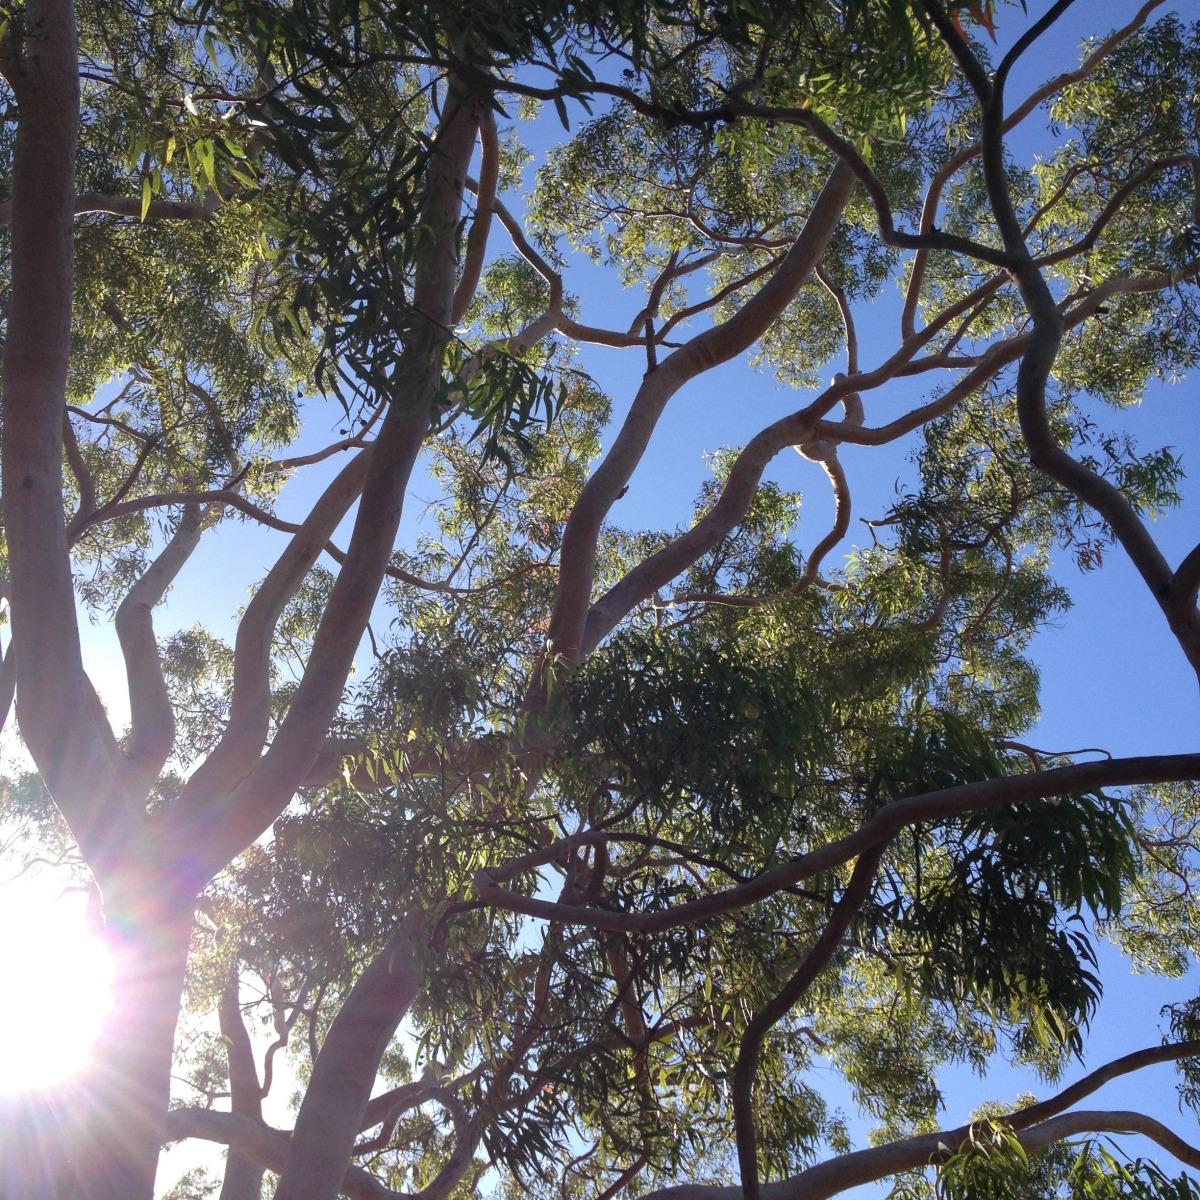 backyard trees